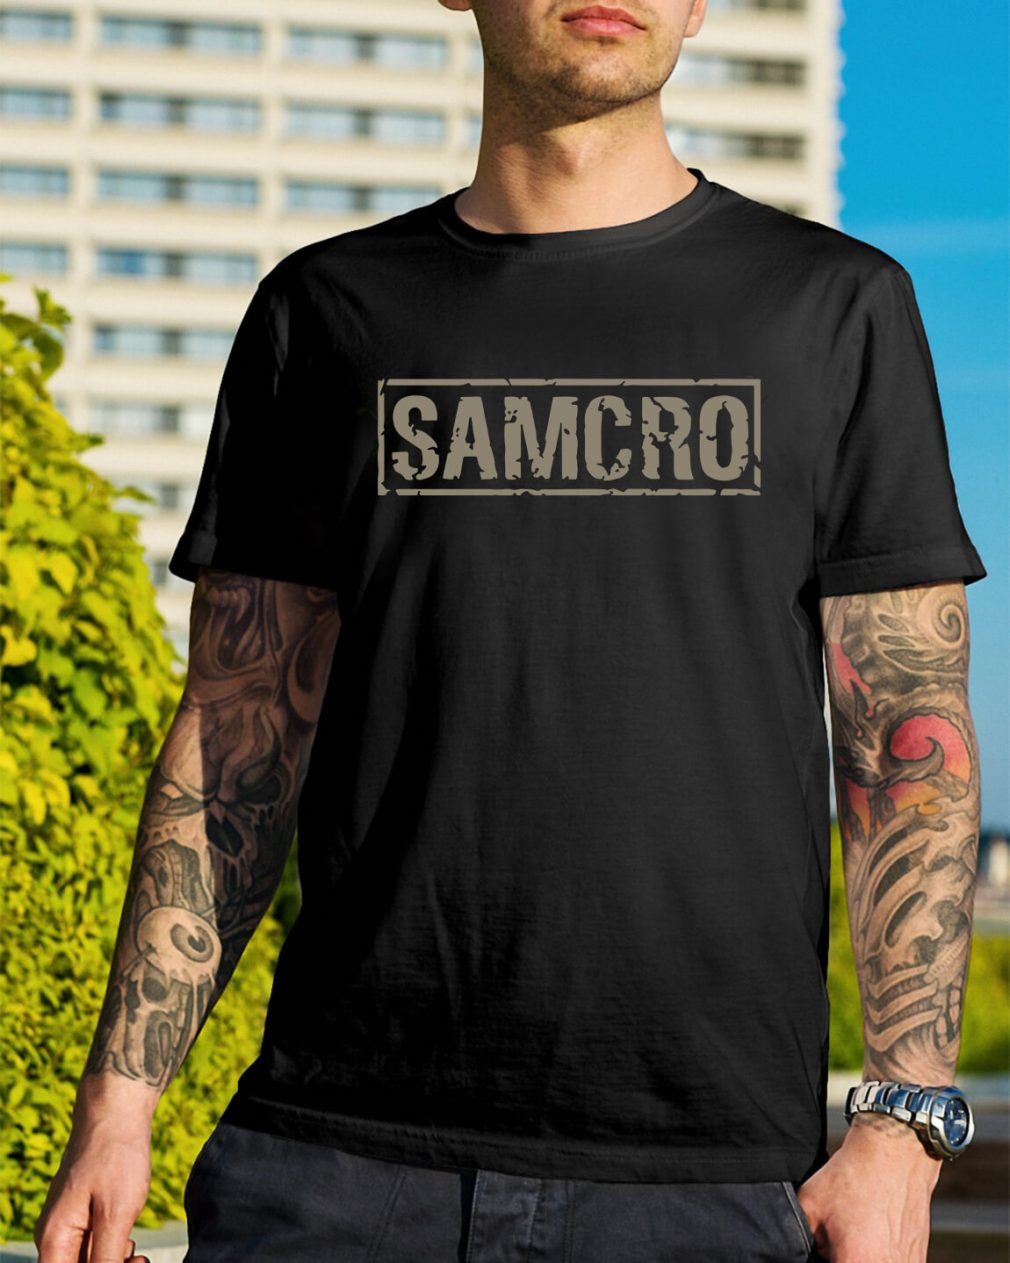 Sons of Anarchy Samcro shirt